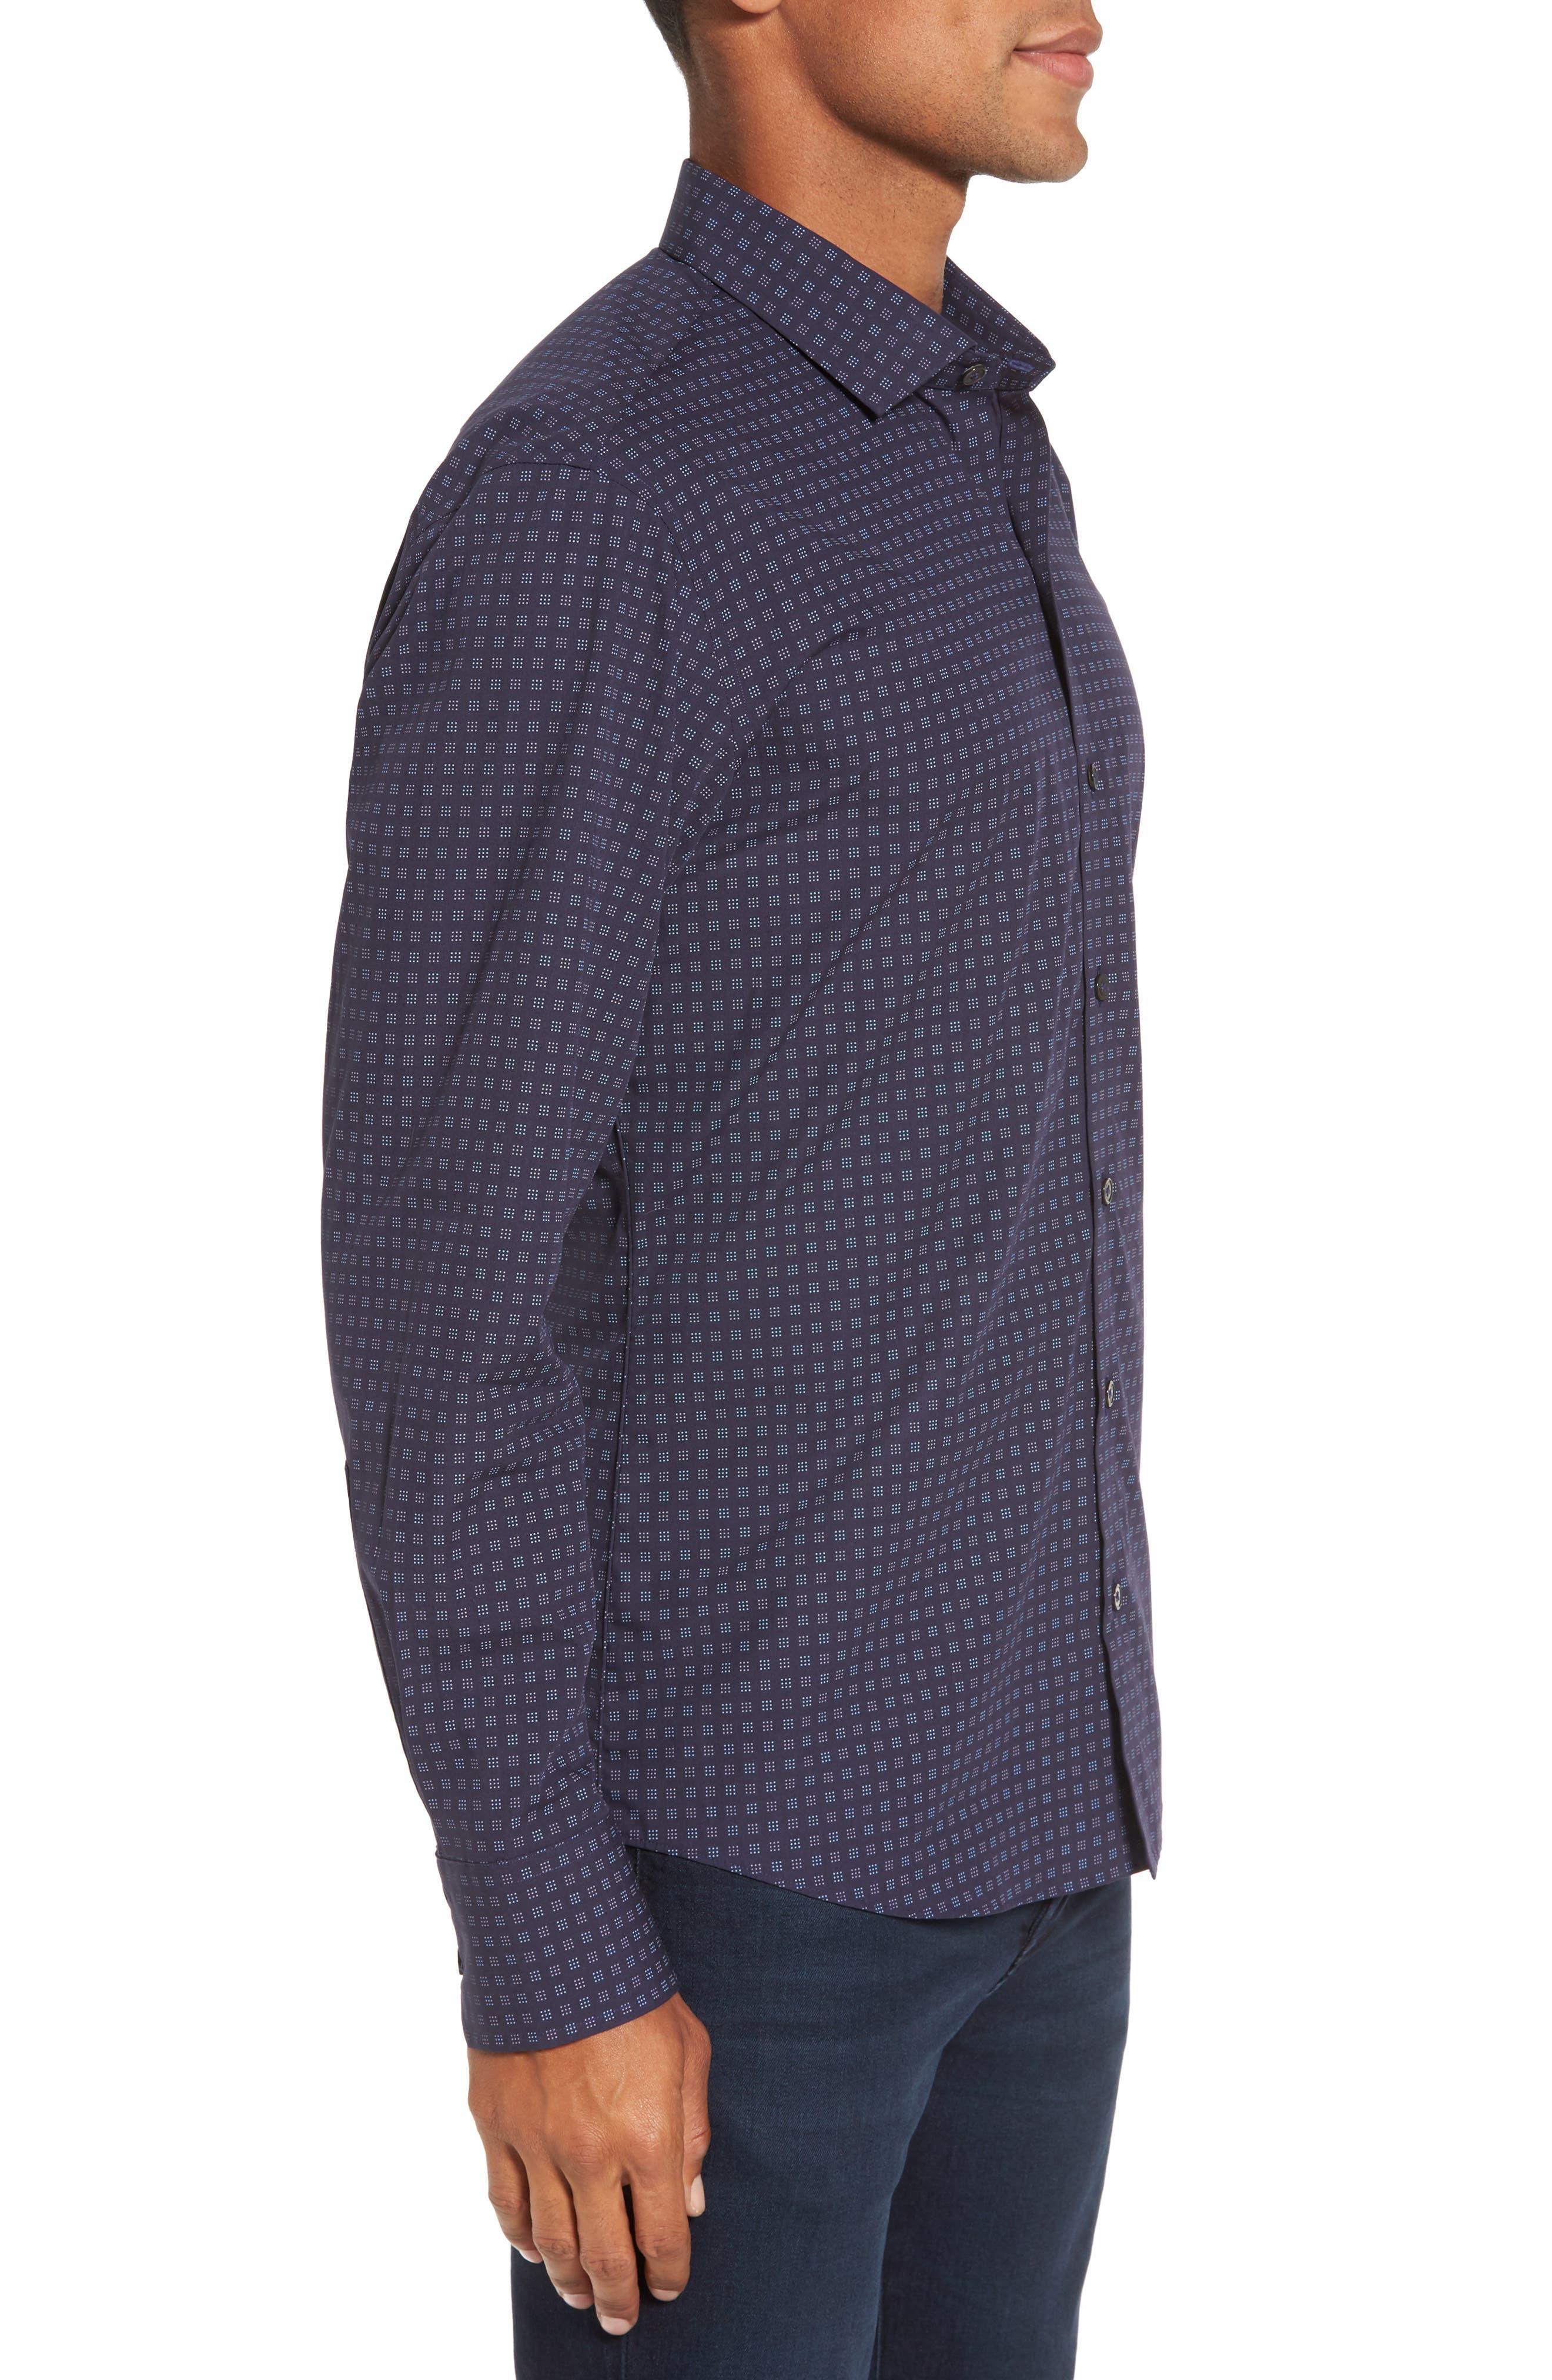 Maison Slim Fit Print Sport Shirt,                             Alternate thumbnail 3, color,                             Navy